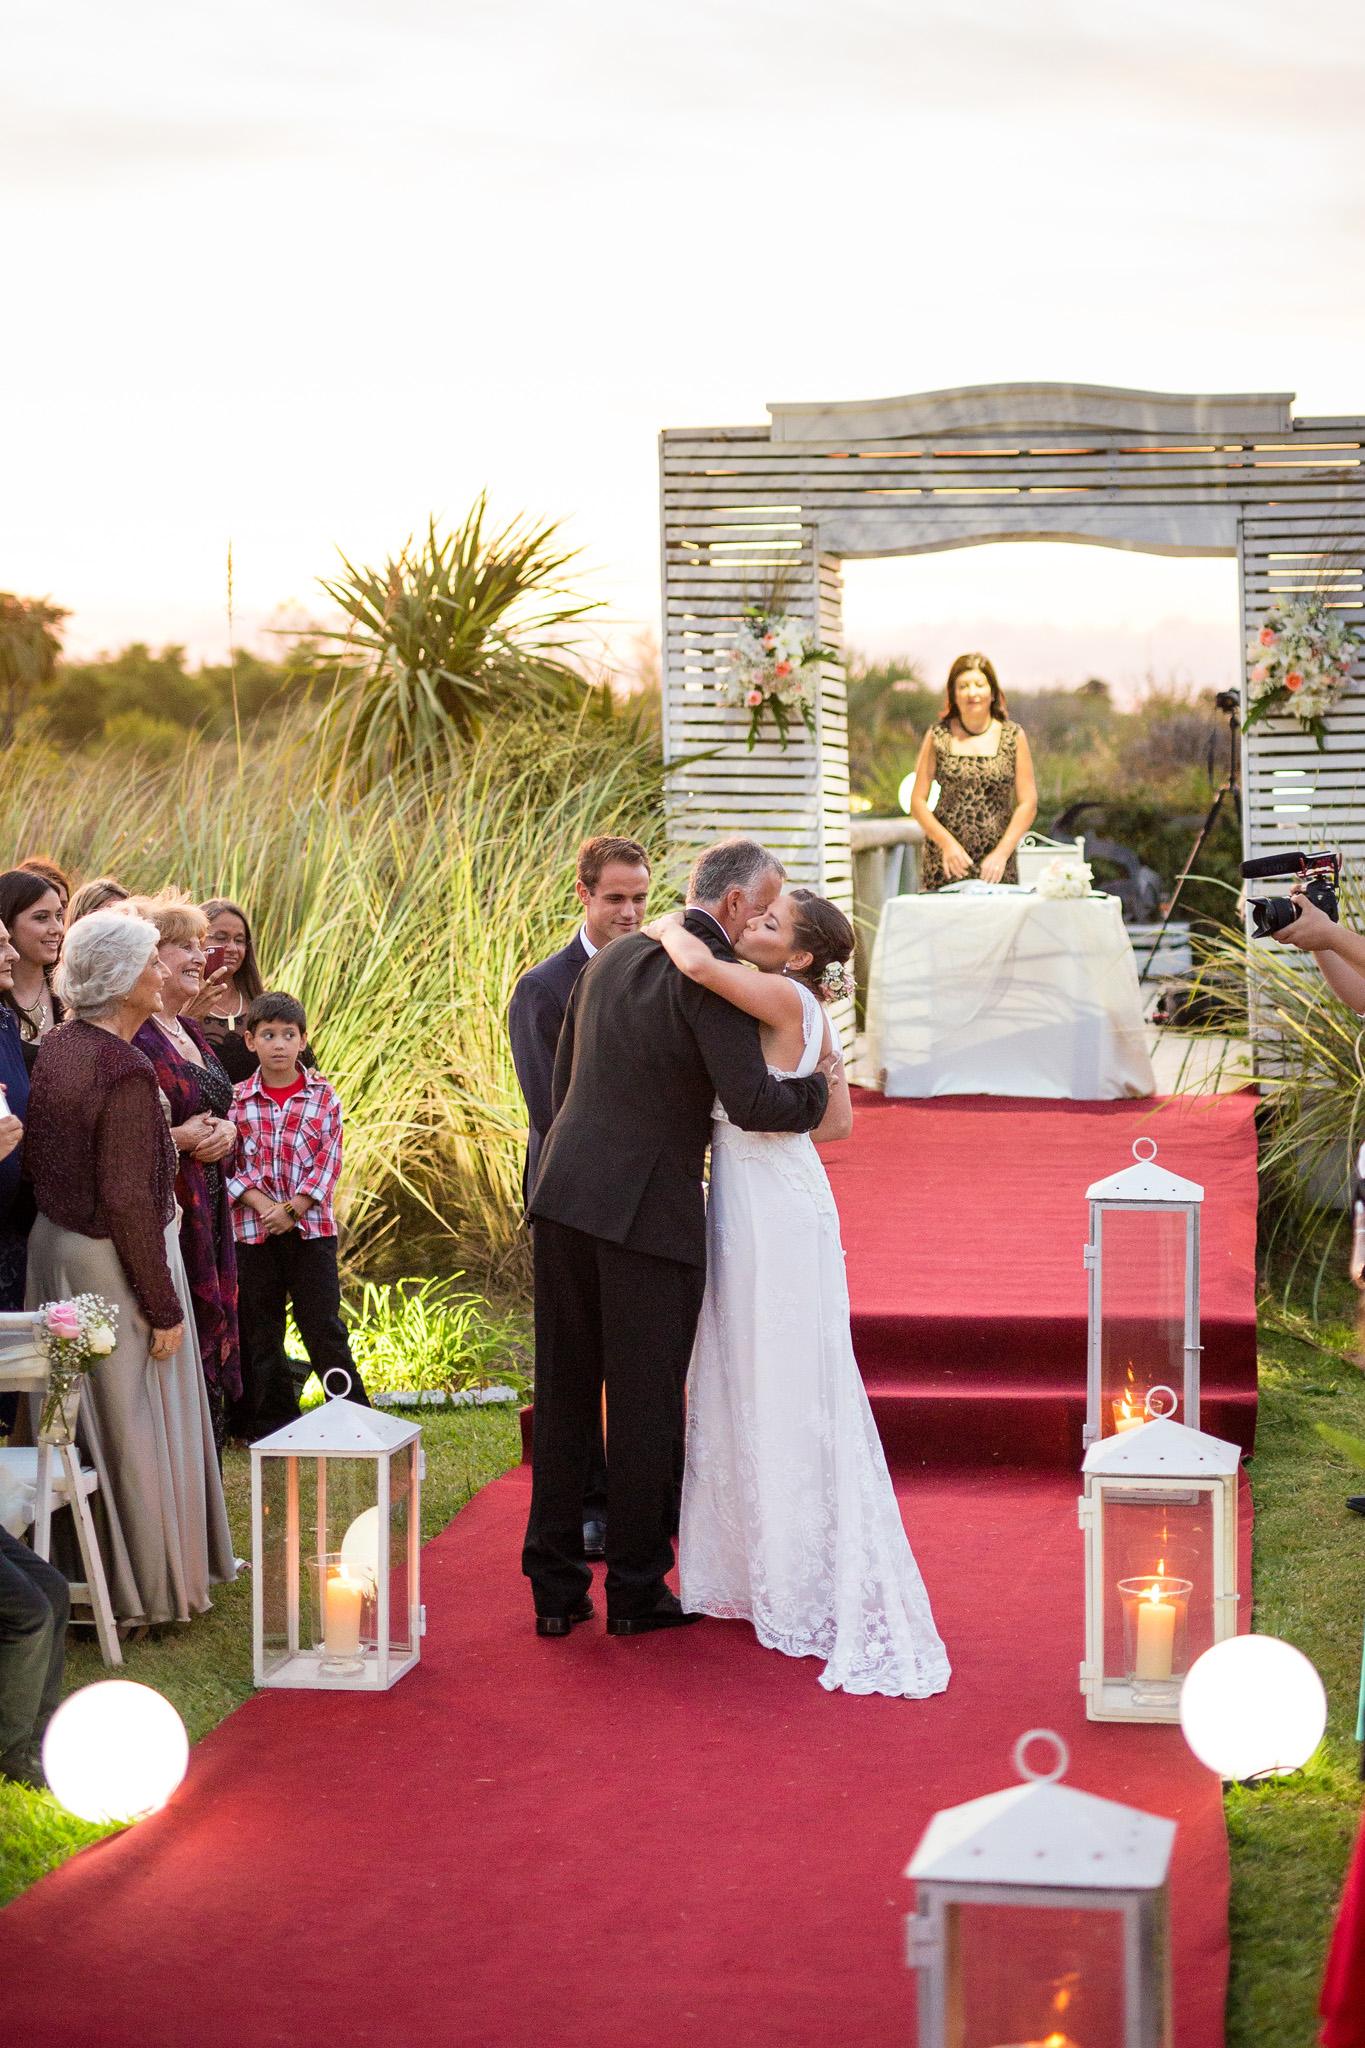 Wedding_Travellers_Destination_Wedding_Photography-48.jpg